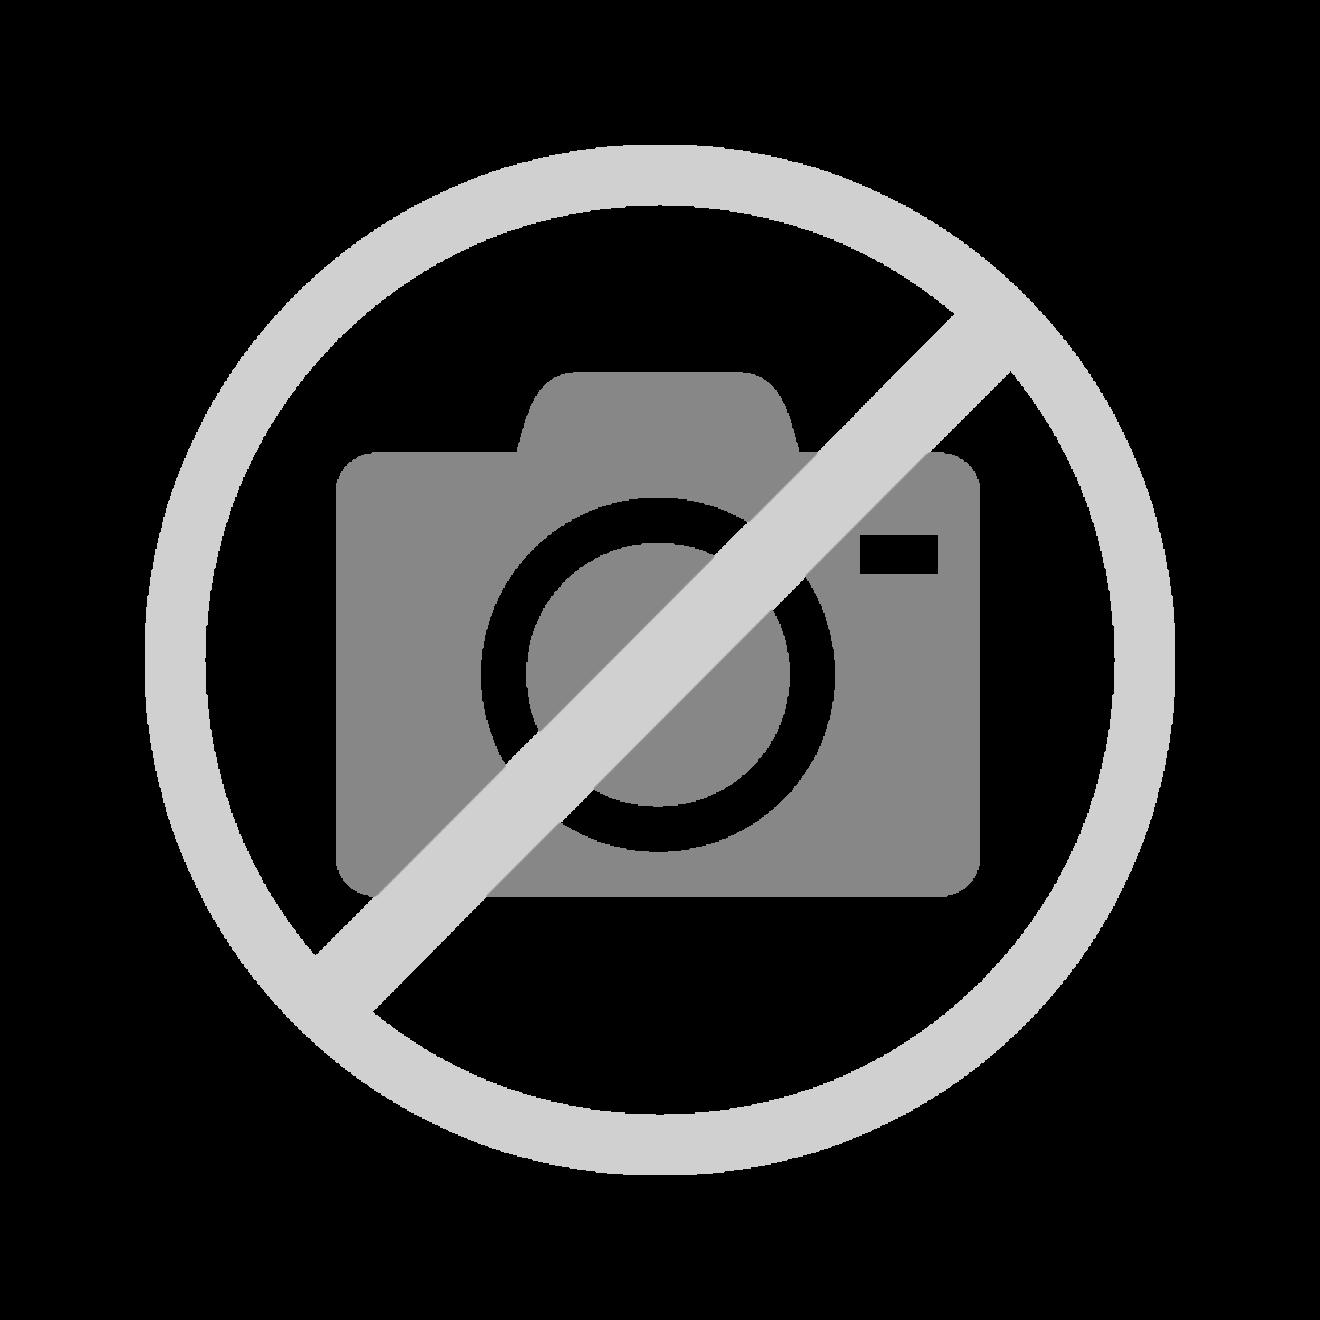 hundebett binz grau weiss gr sse xs m hundebetten online kaufen. Black Bedroom Furniture Sets. Home Design Ideas